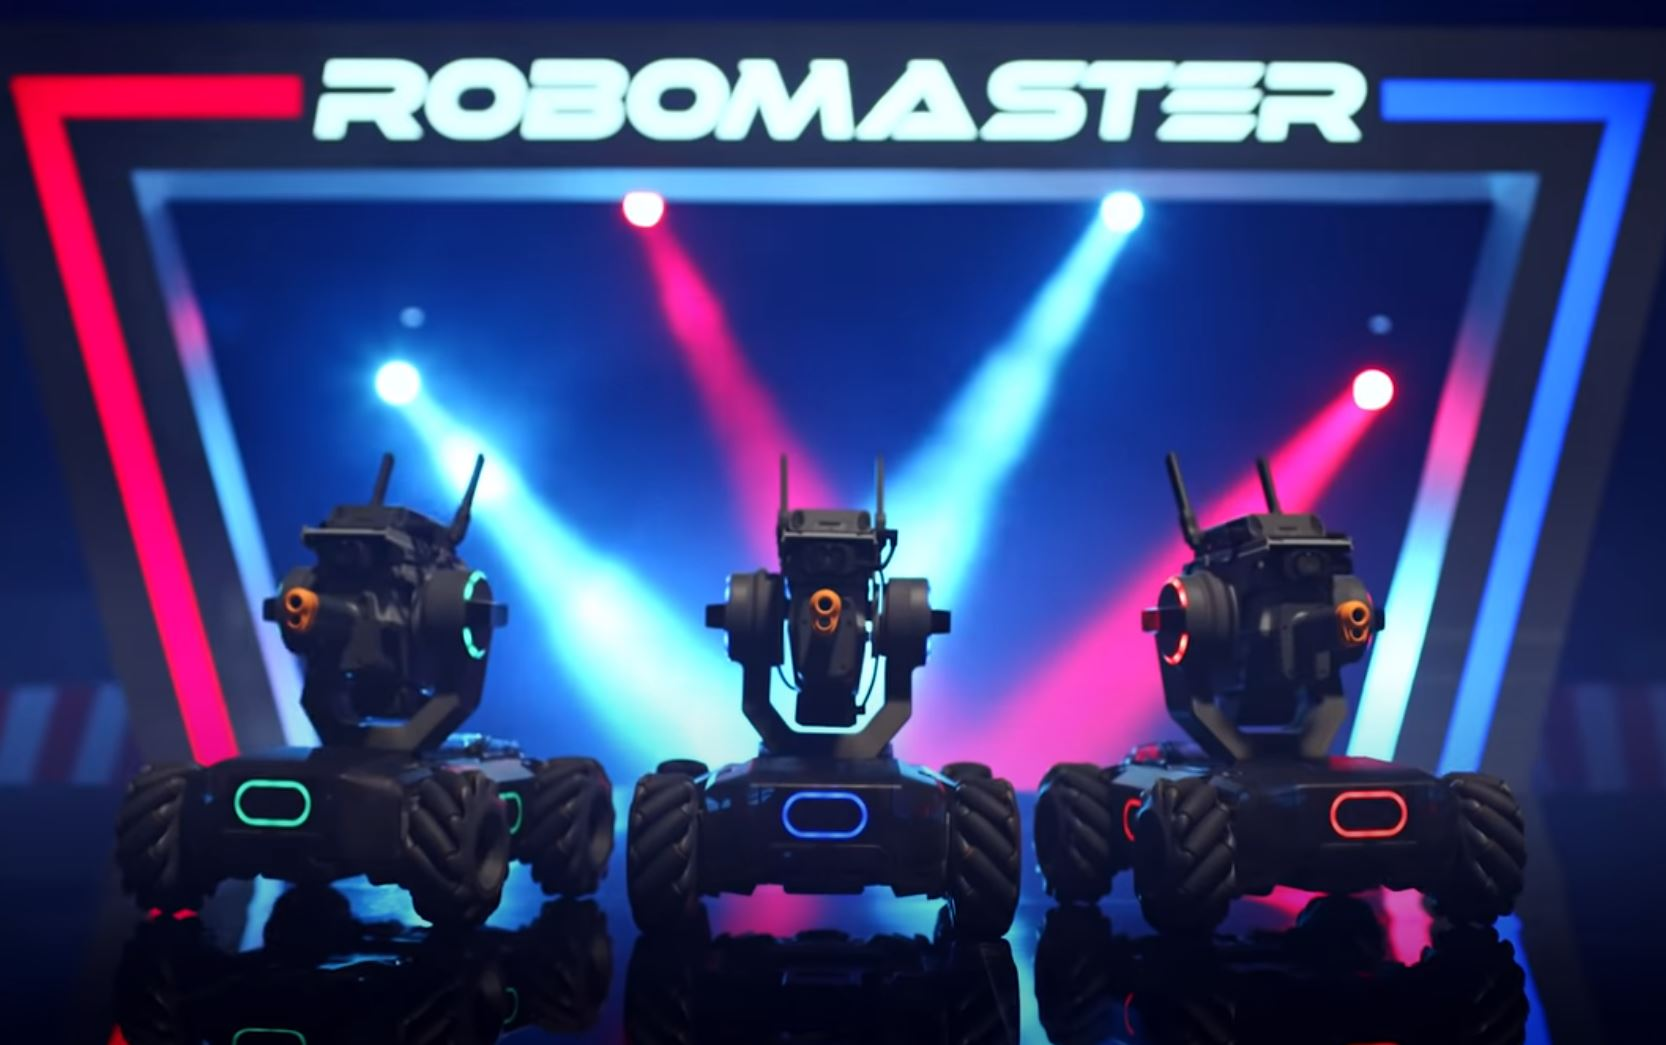 DJI RoboMaster S1 - Trio